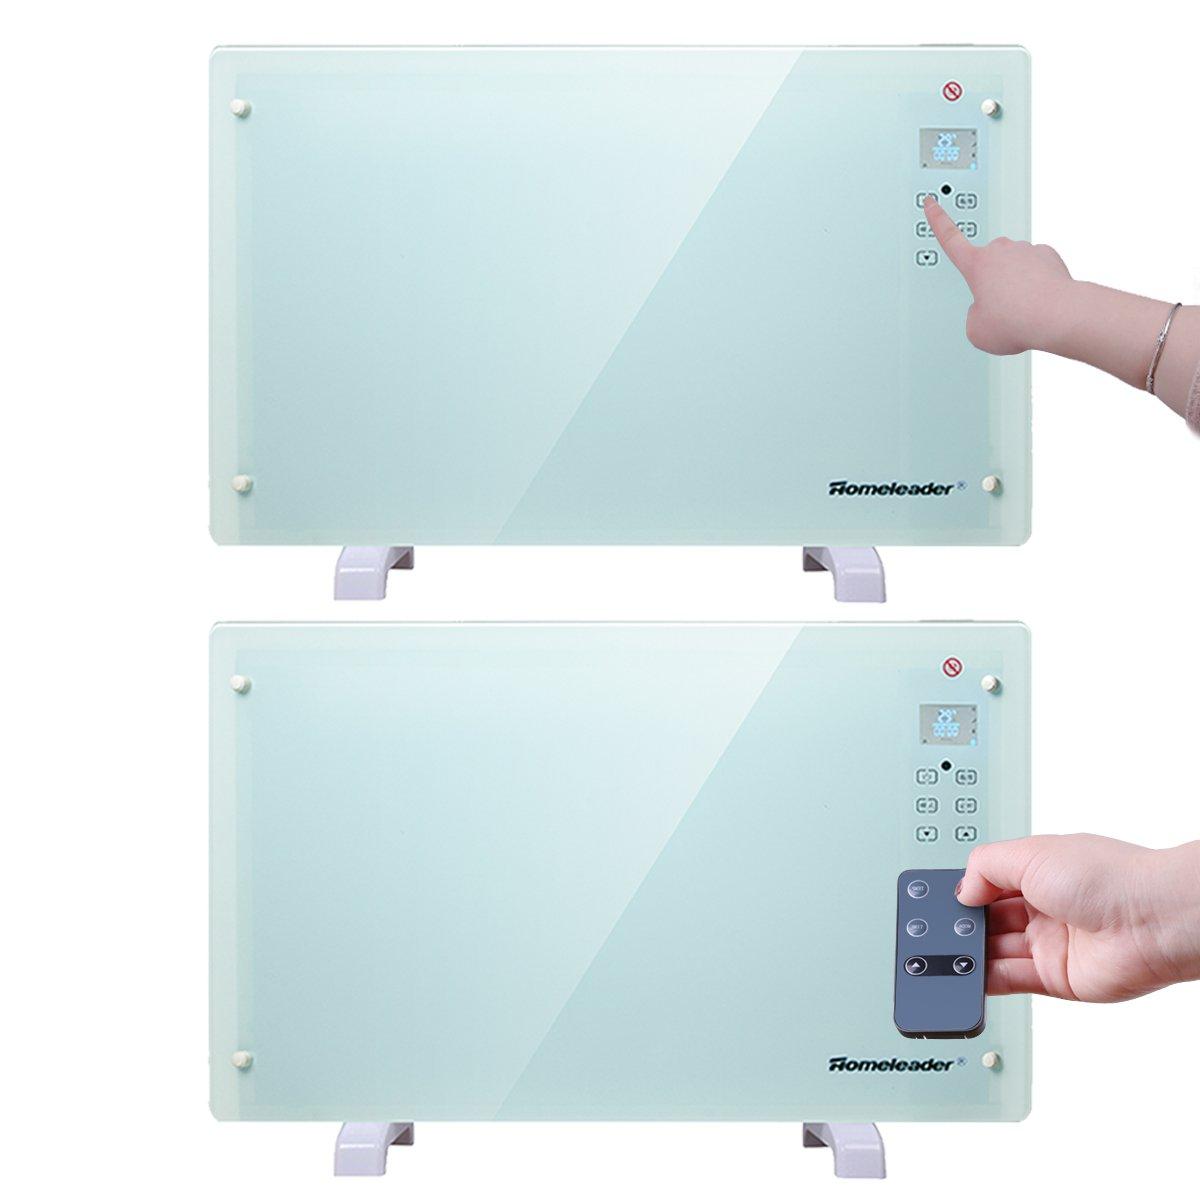 Amazon com: Homeleader Electric Panel Heater GH-15F, Crystal